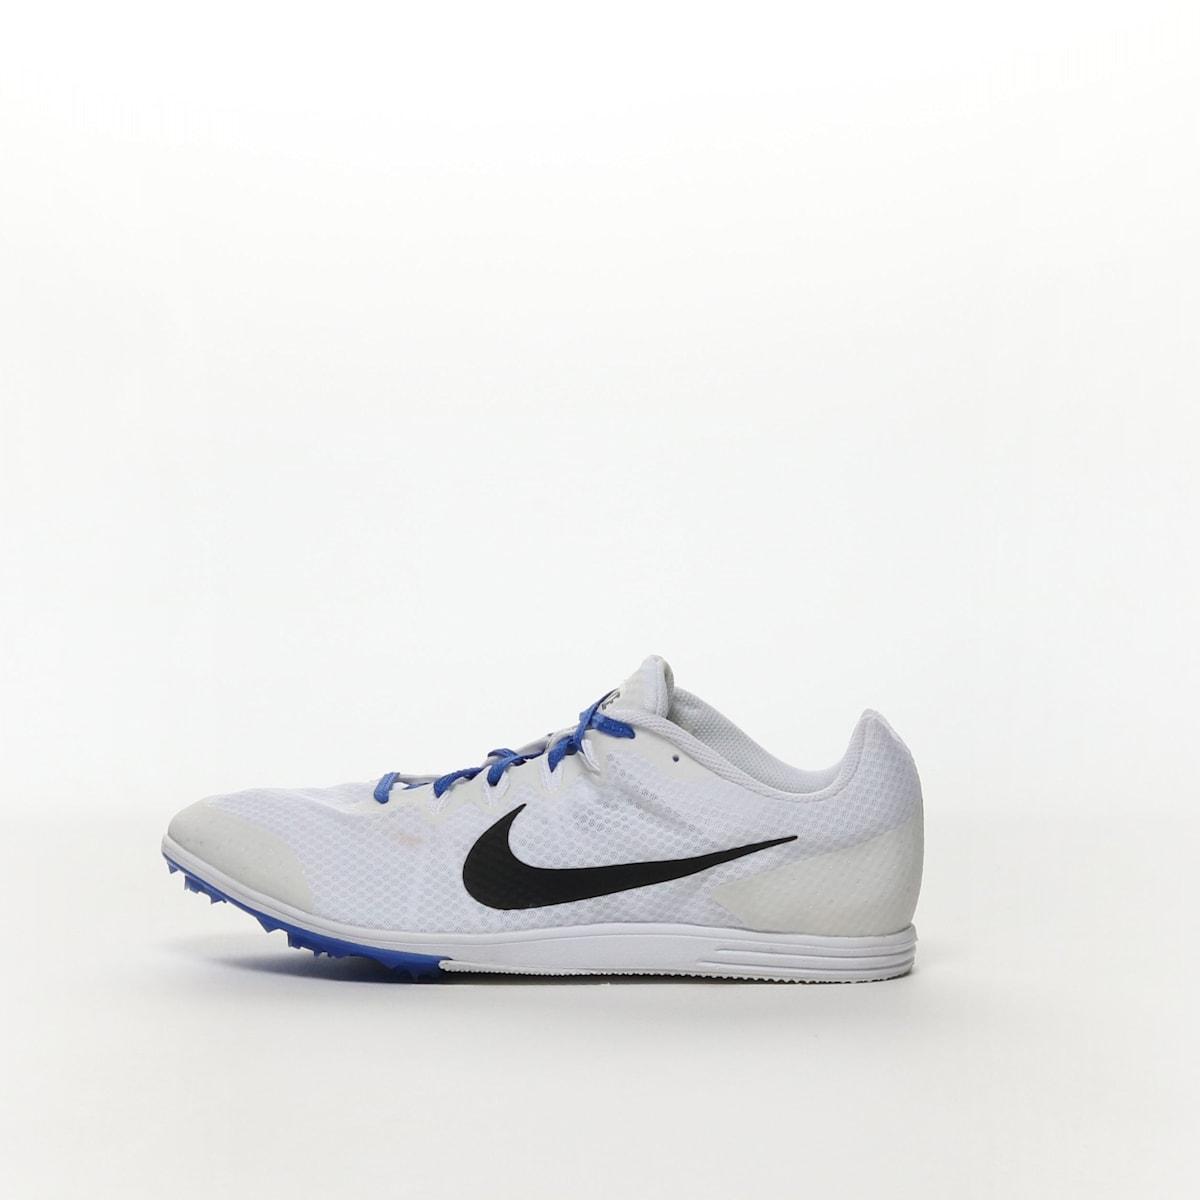 sale retailer d2165 5dd4c ... Nike Zoom Rival D 9 Track Spike.  Actual Shoe